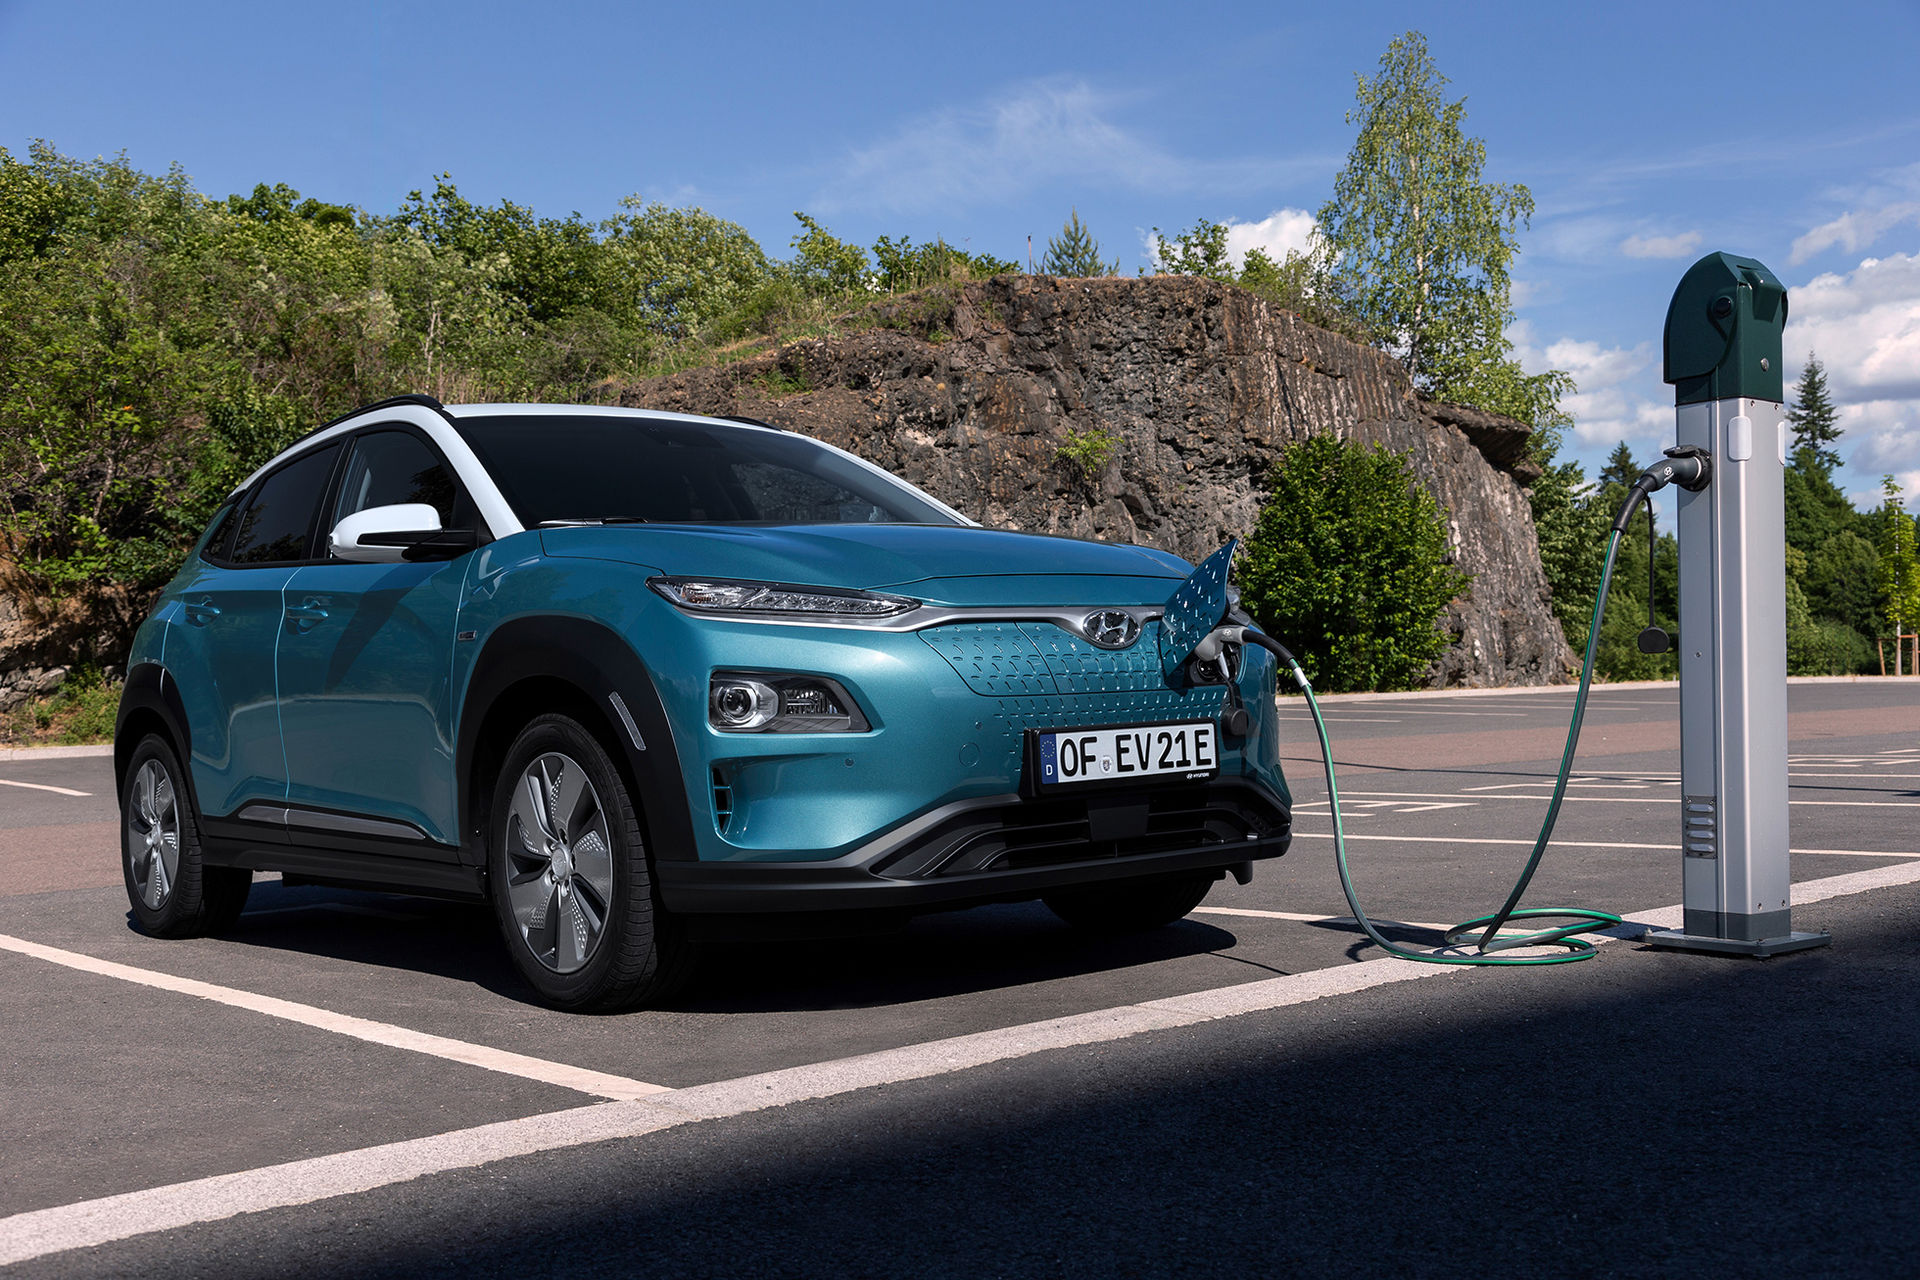 Hyundai lanserar uppdaterad Kona